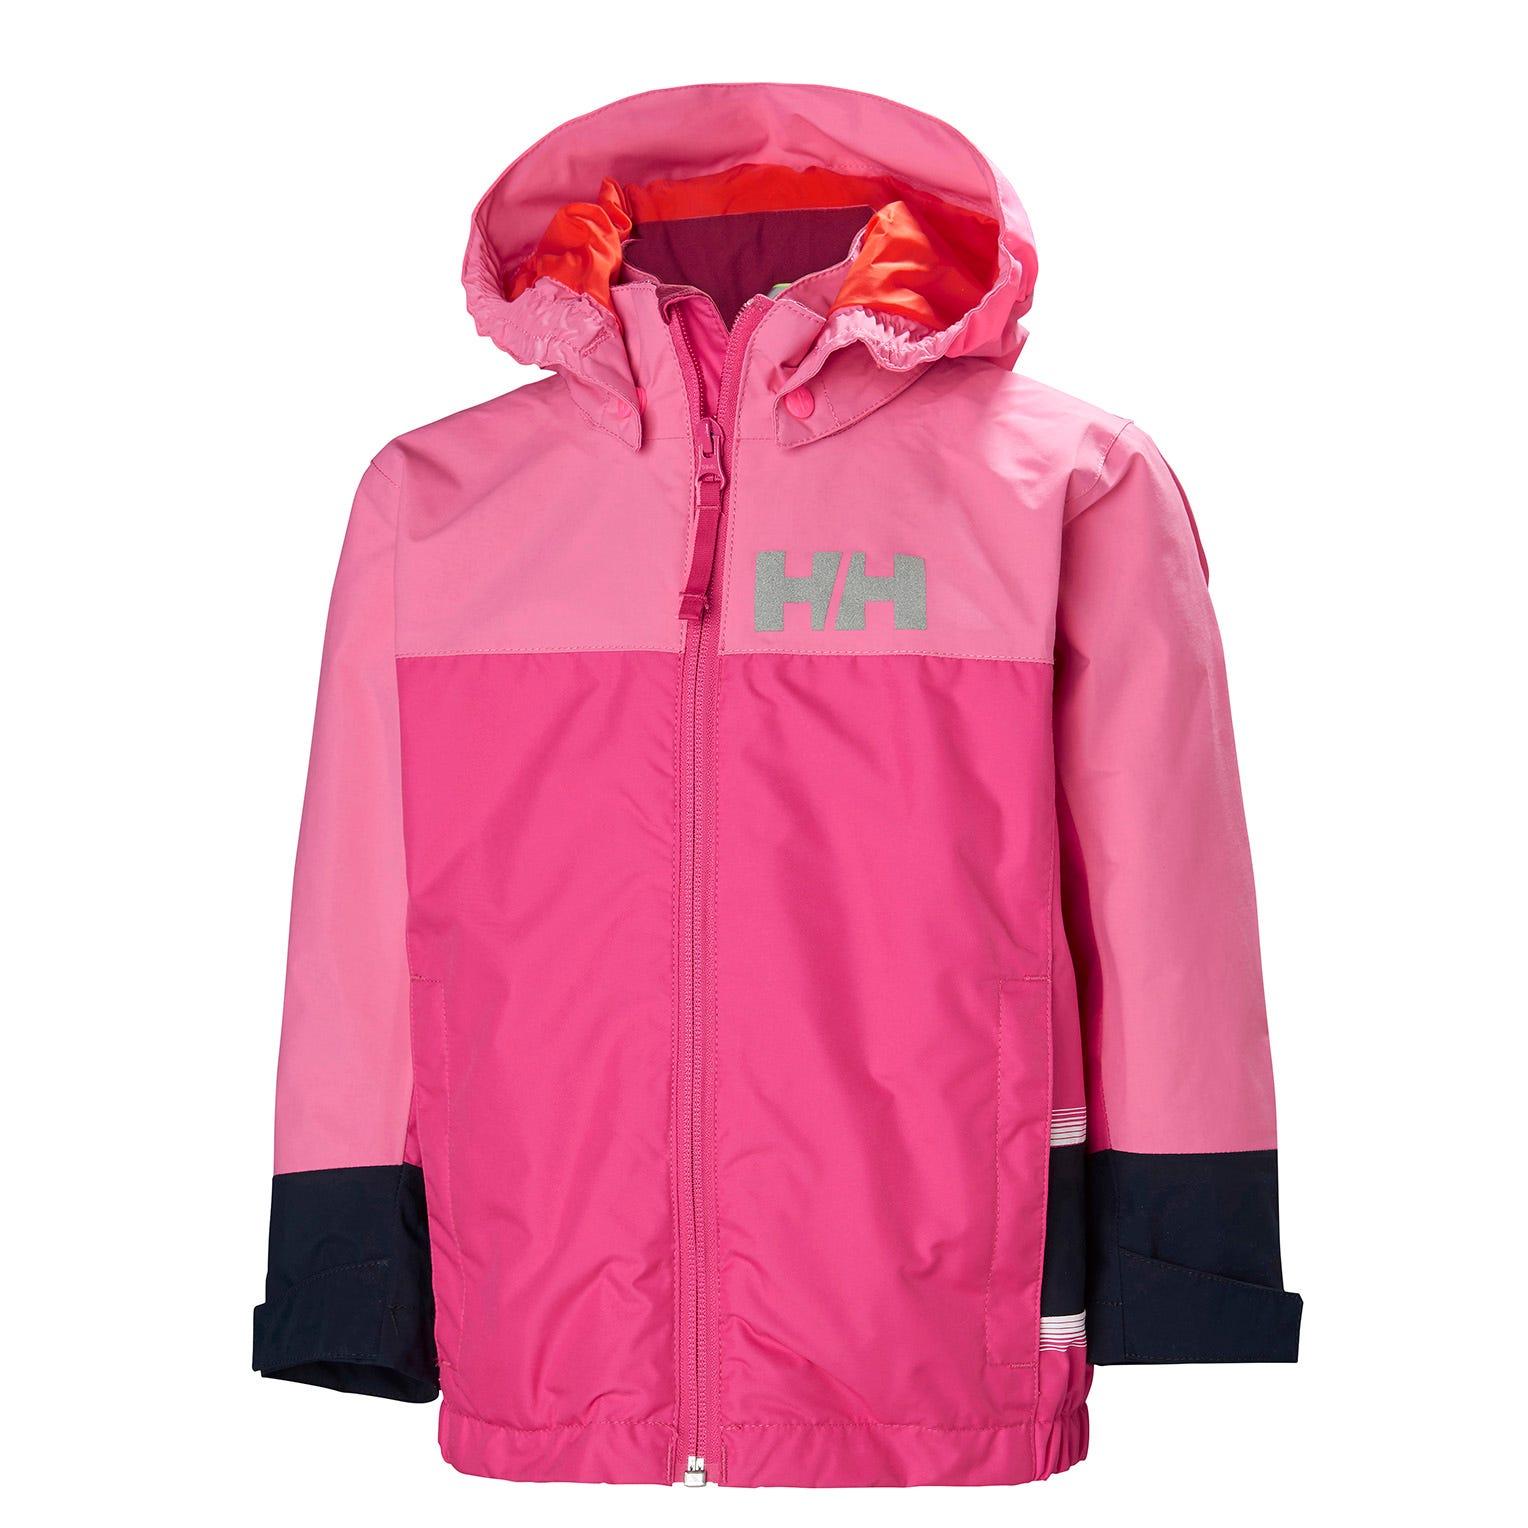 Helly Hansen Kids Norse Jacket Parka Pink 98/3